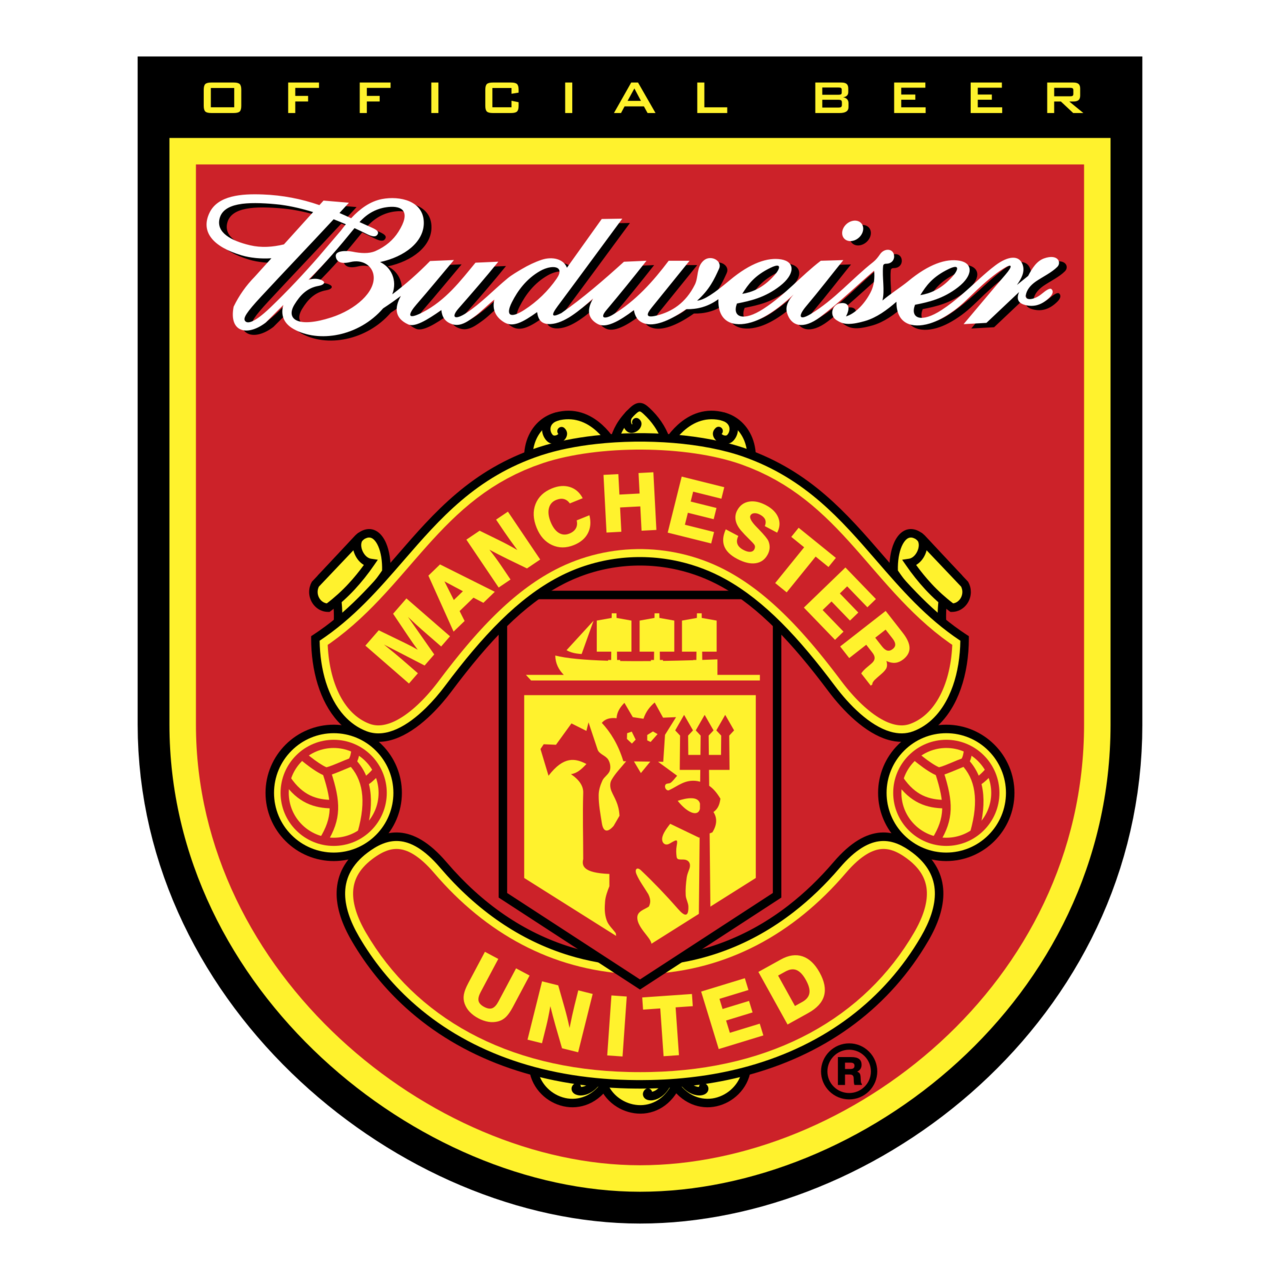 budweiser manchester united logo png transparent brands logos budweiser manchester united logo png